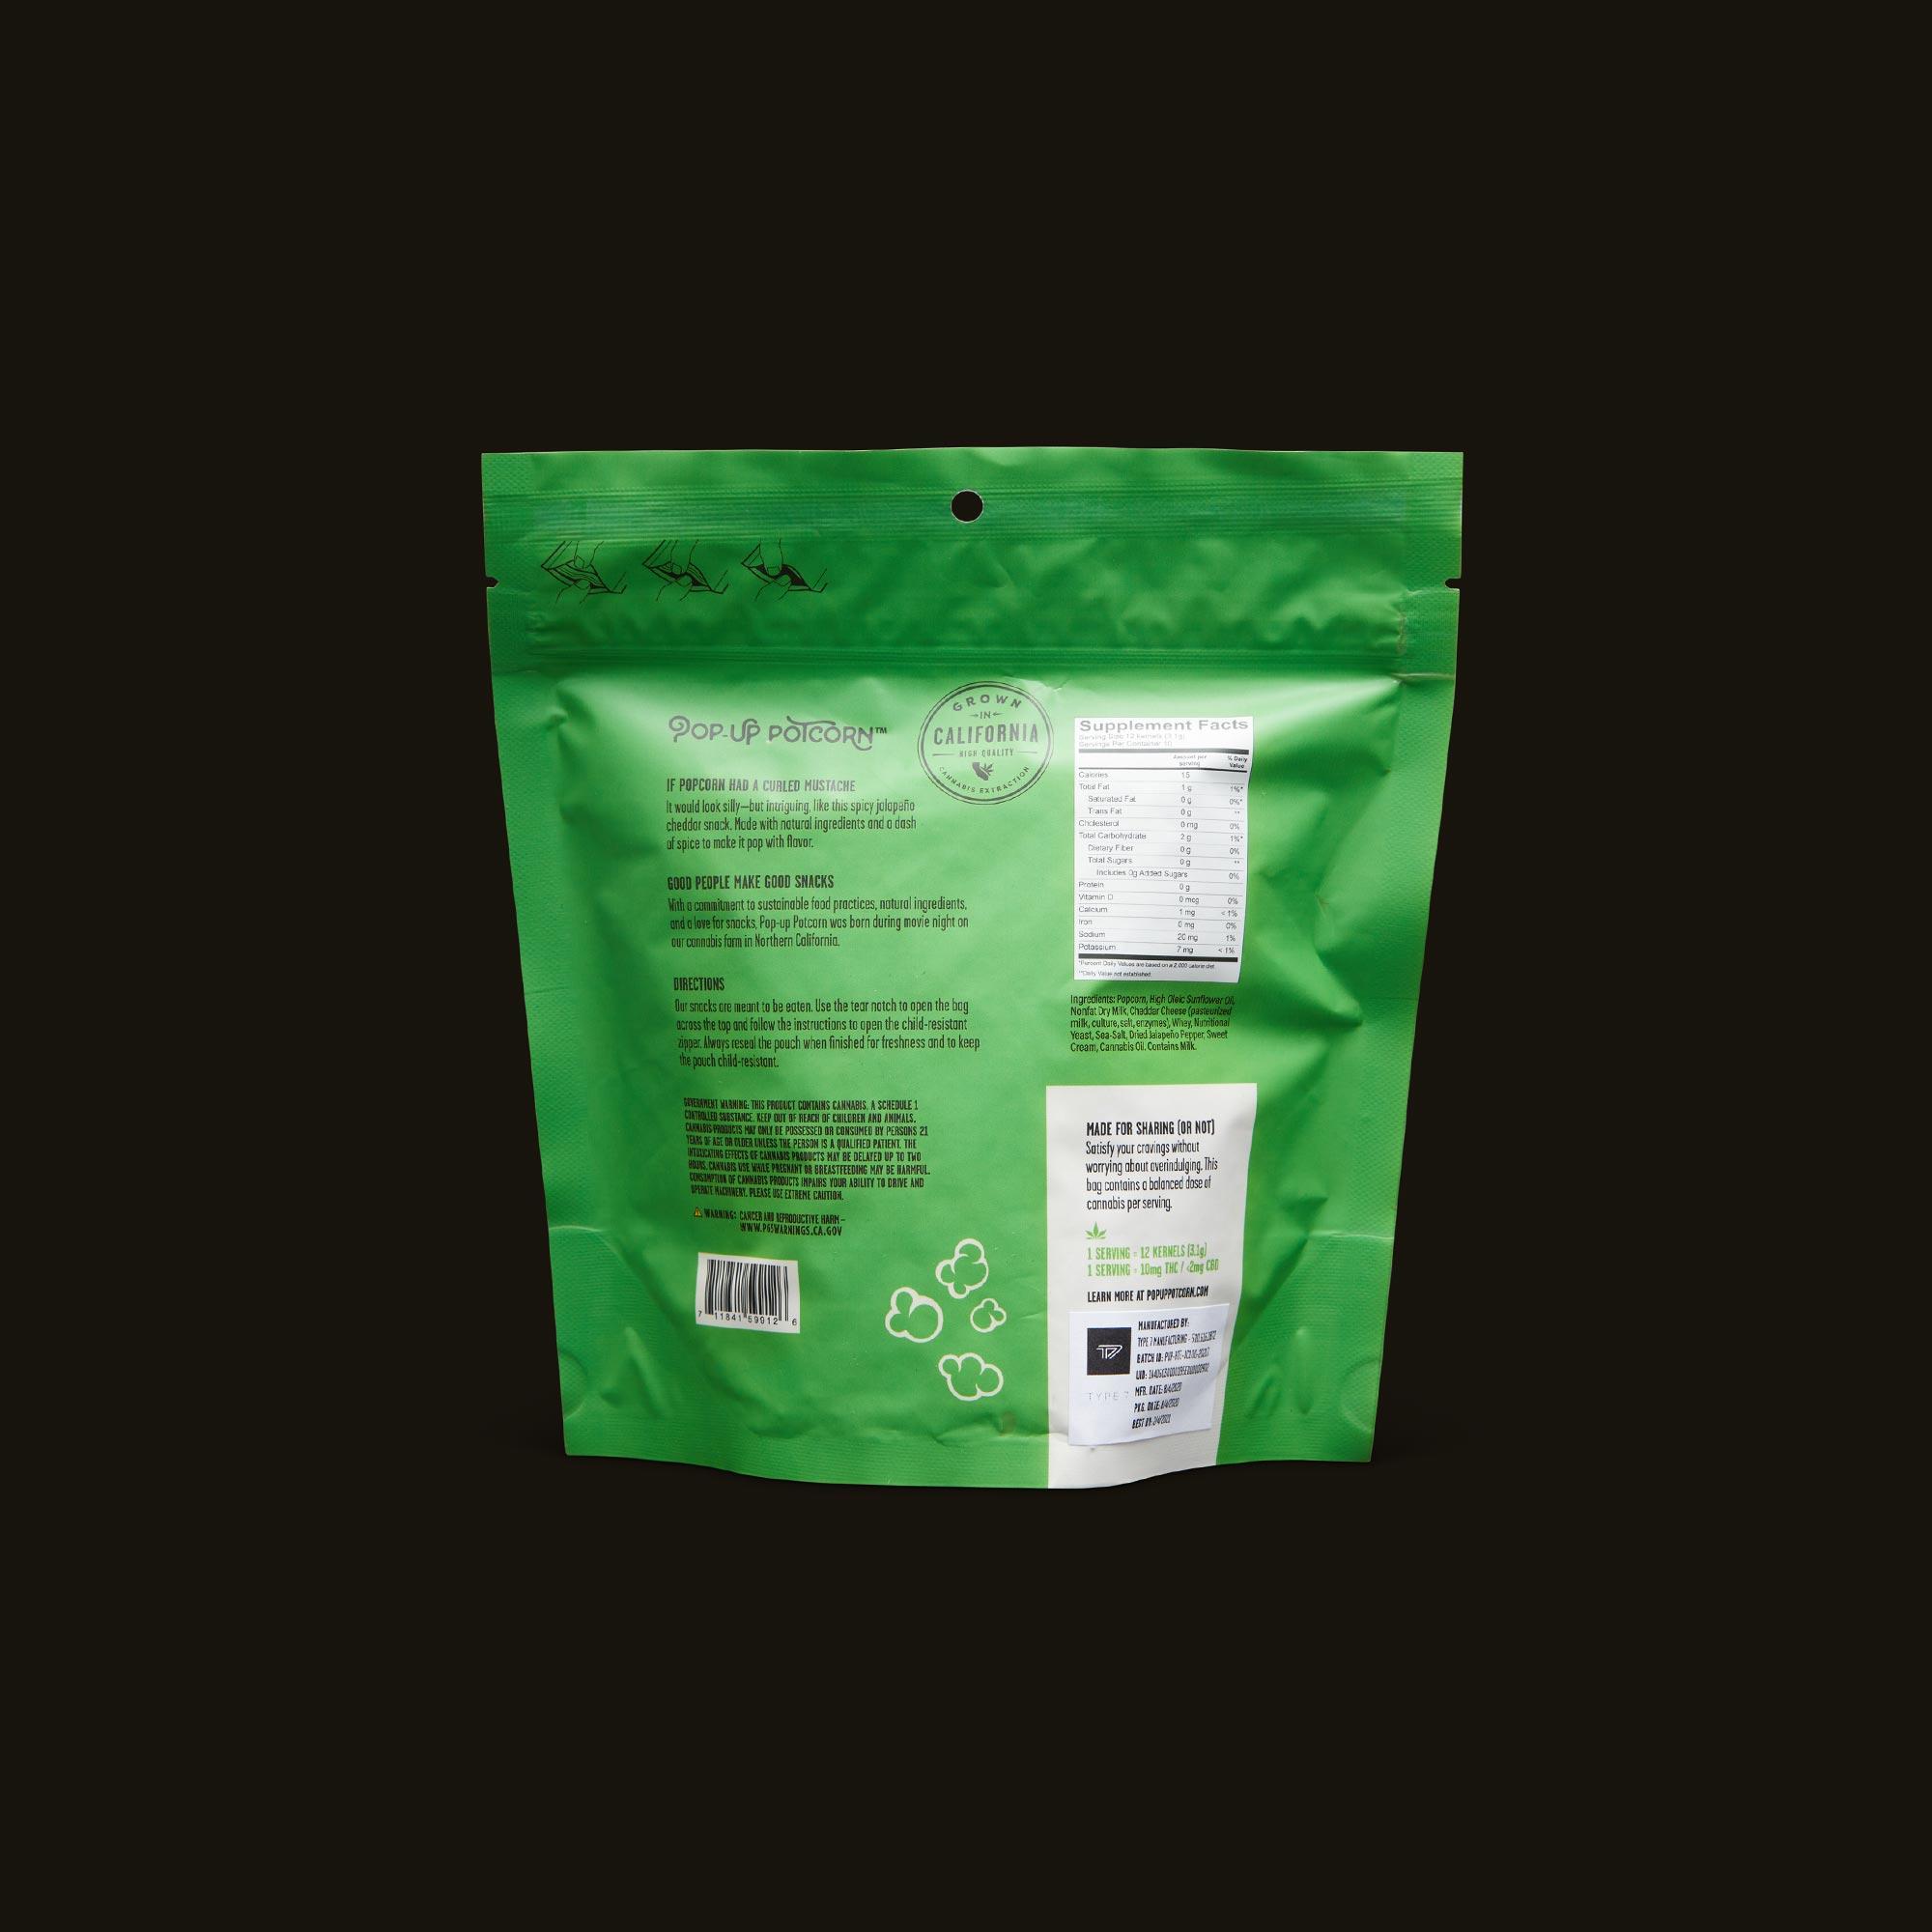 Pop-Up Potcorn Jalapeno Cheddar Popcorn 10:1 - 10 Servings Nutrition Facts